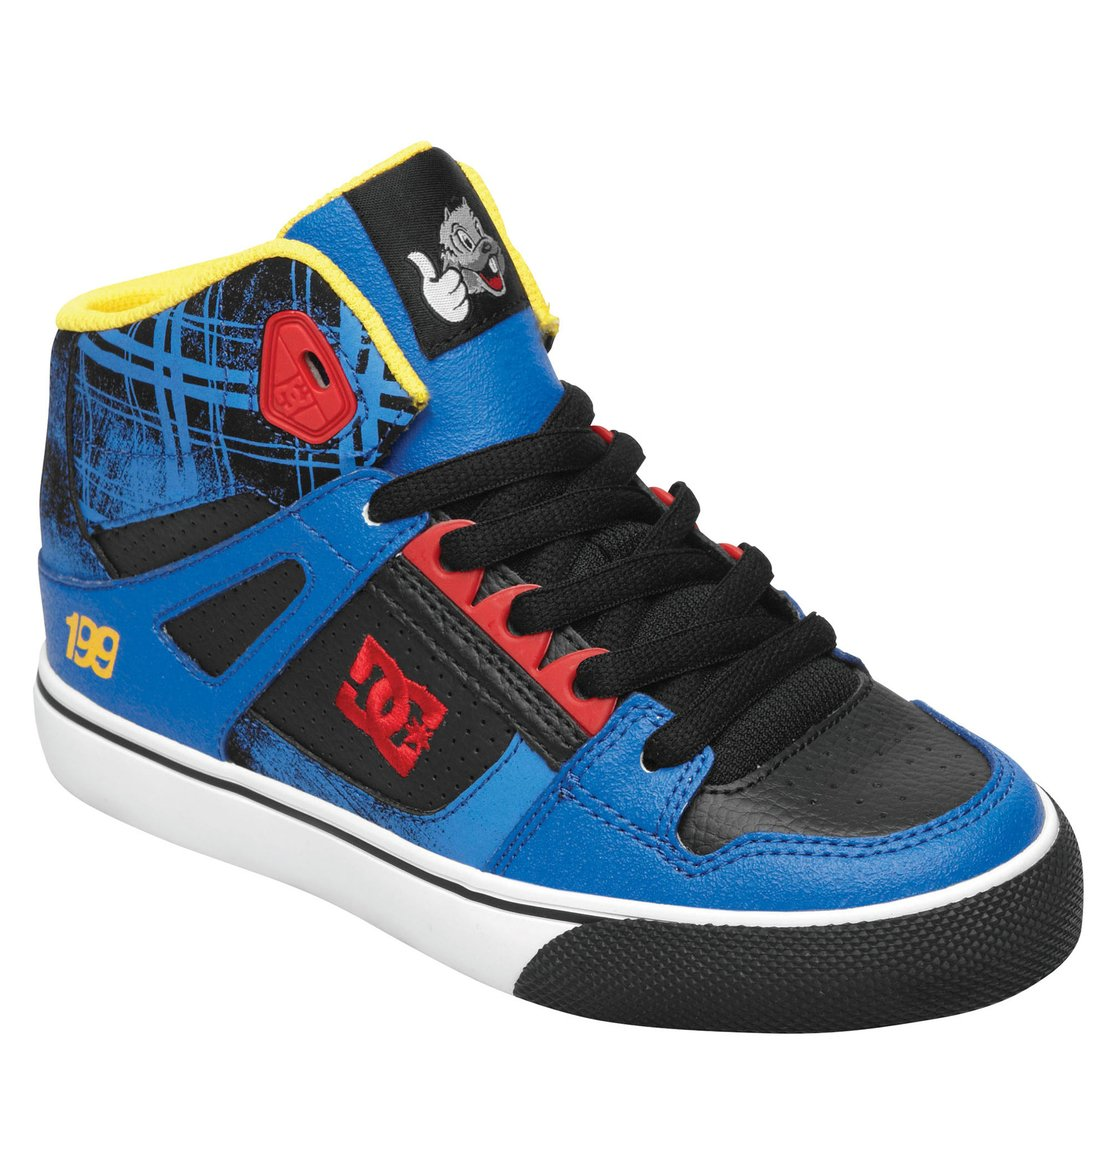 Travis Pastrana Dc Shoes